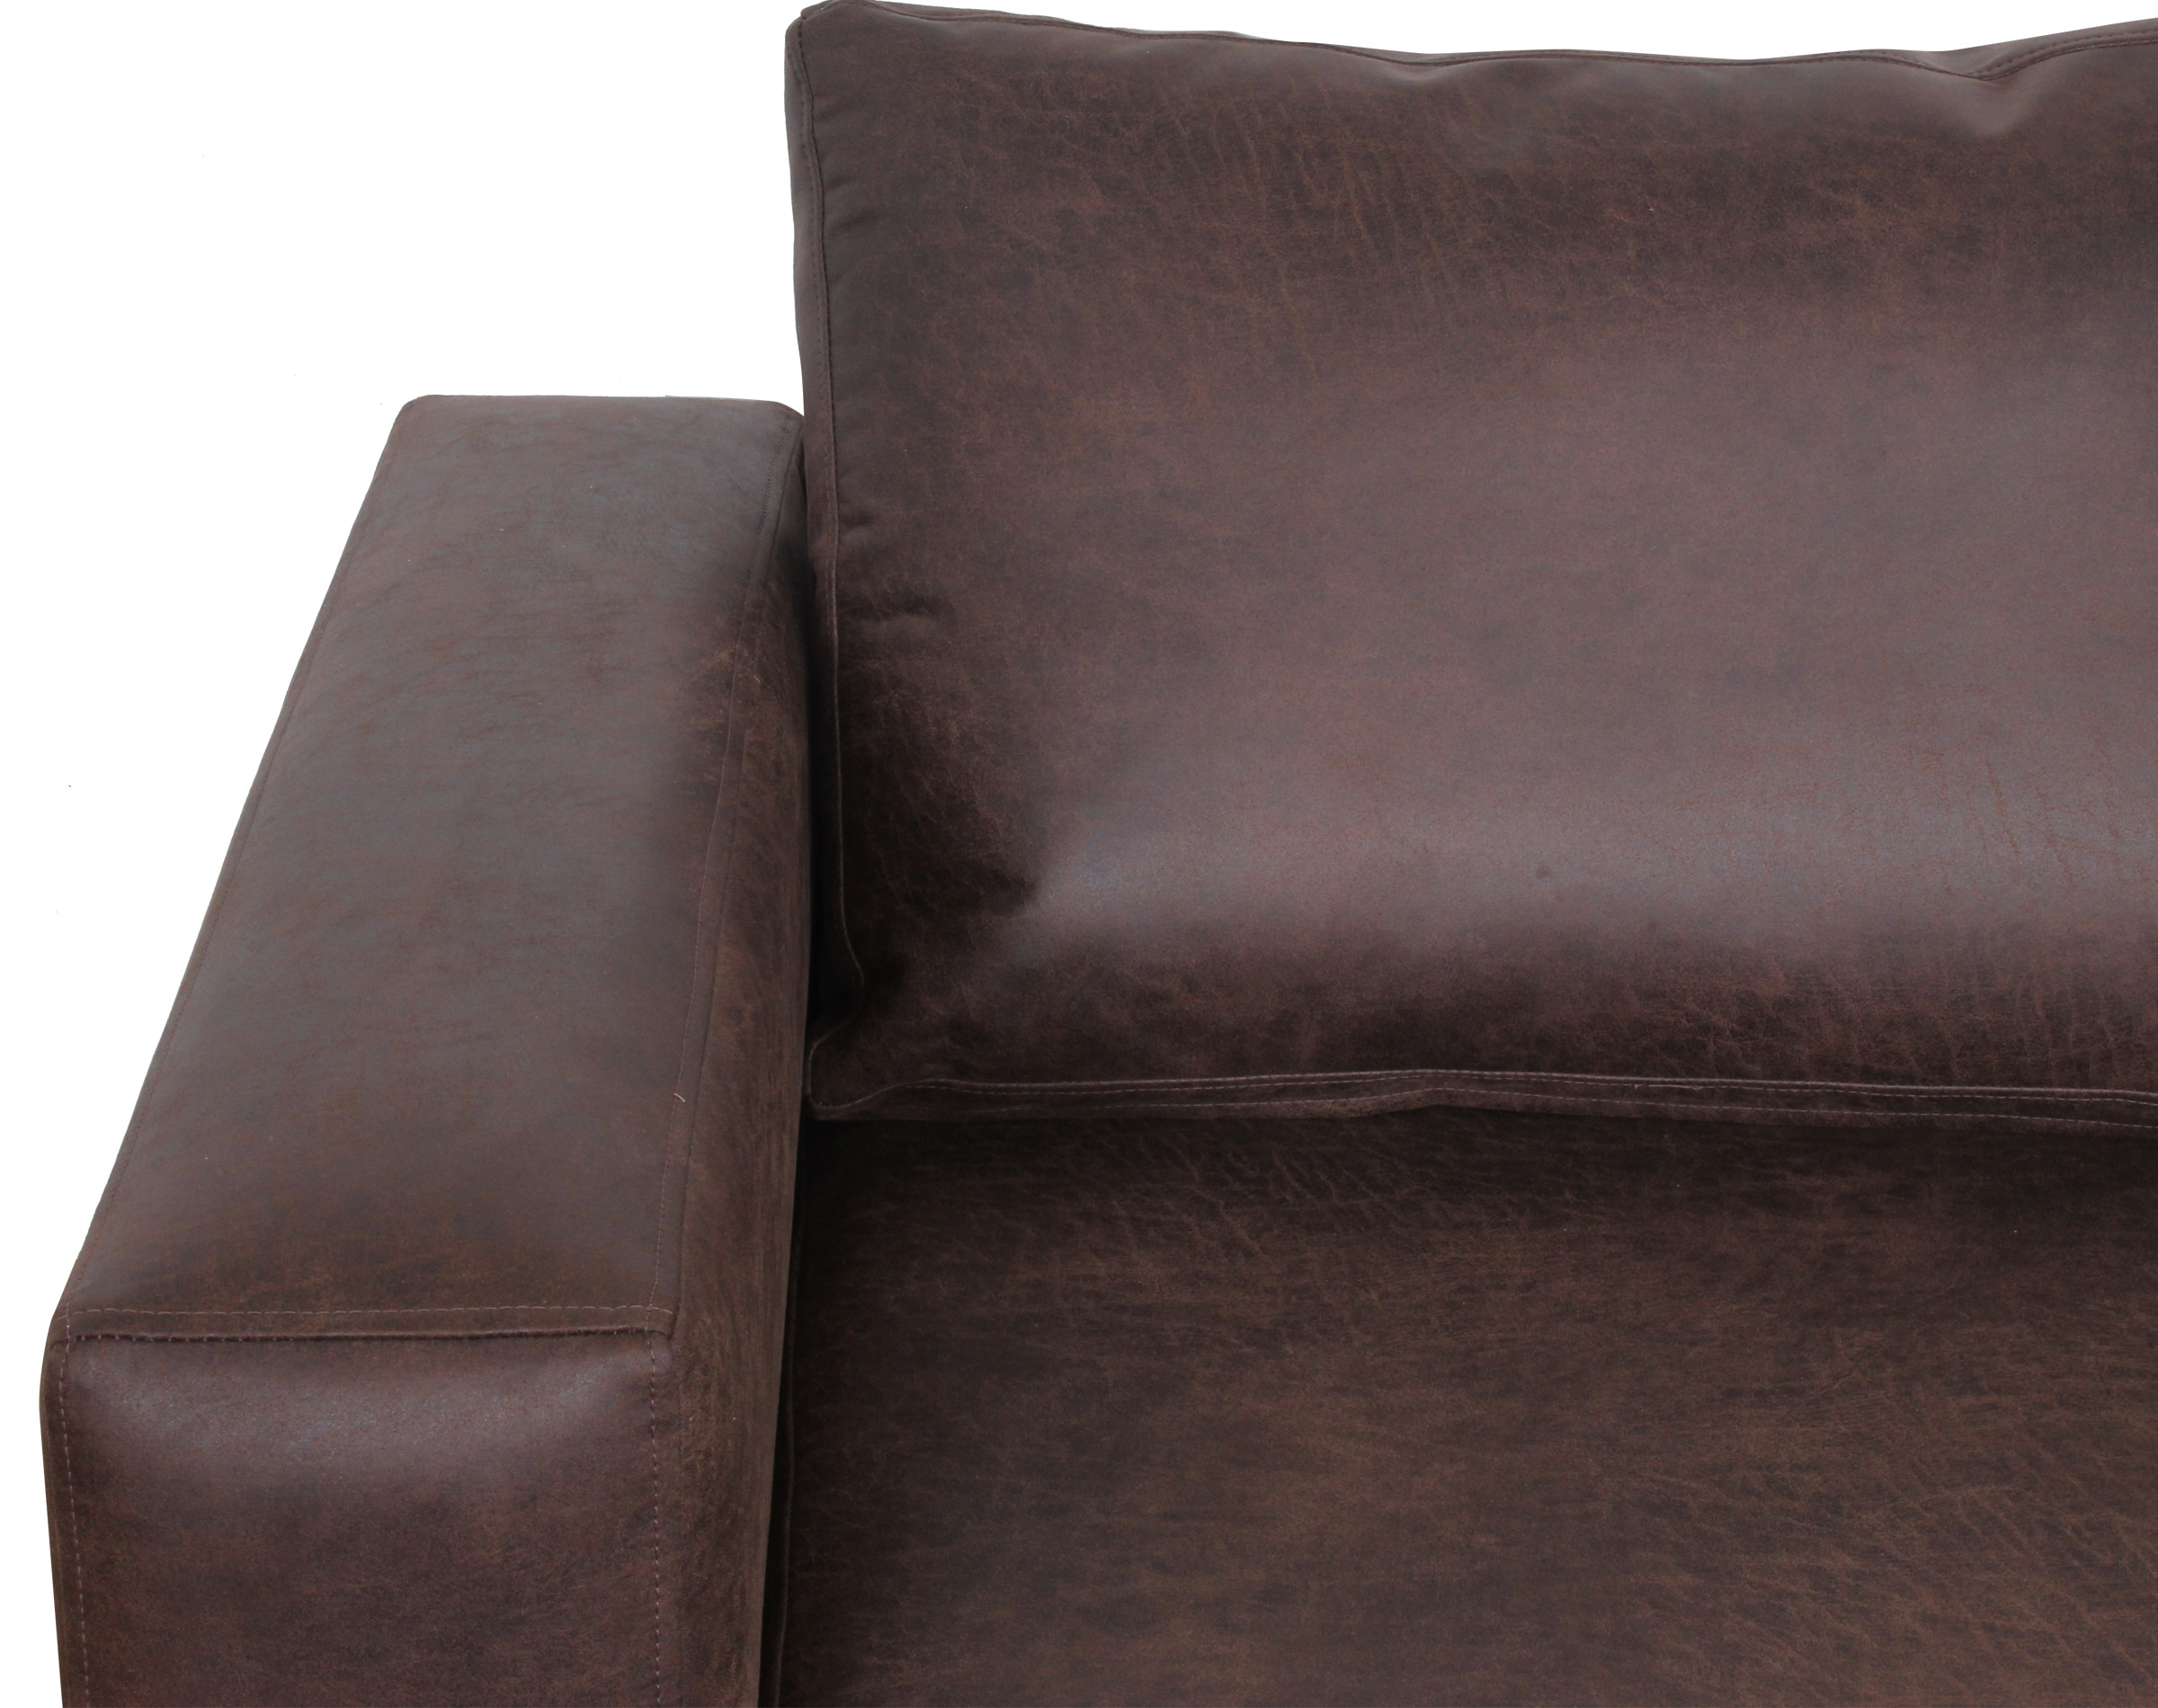 Sofa Seccional Izq Cuero Bonded 70 Dk Brown3